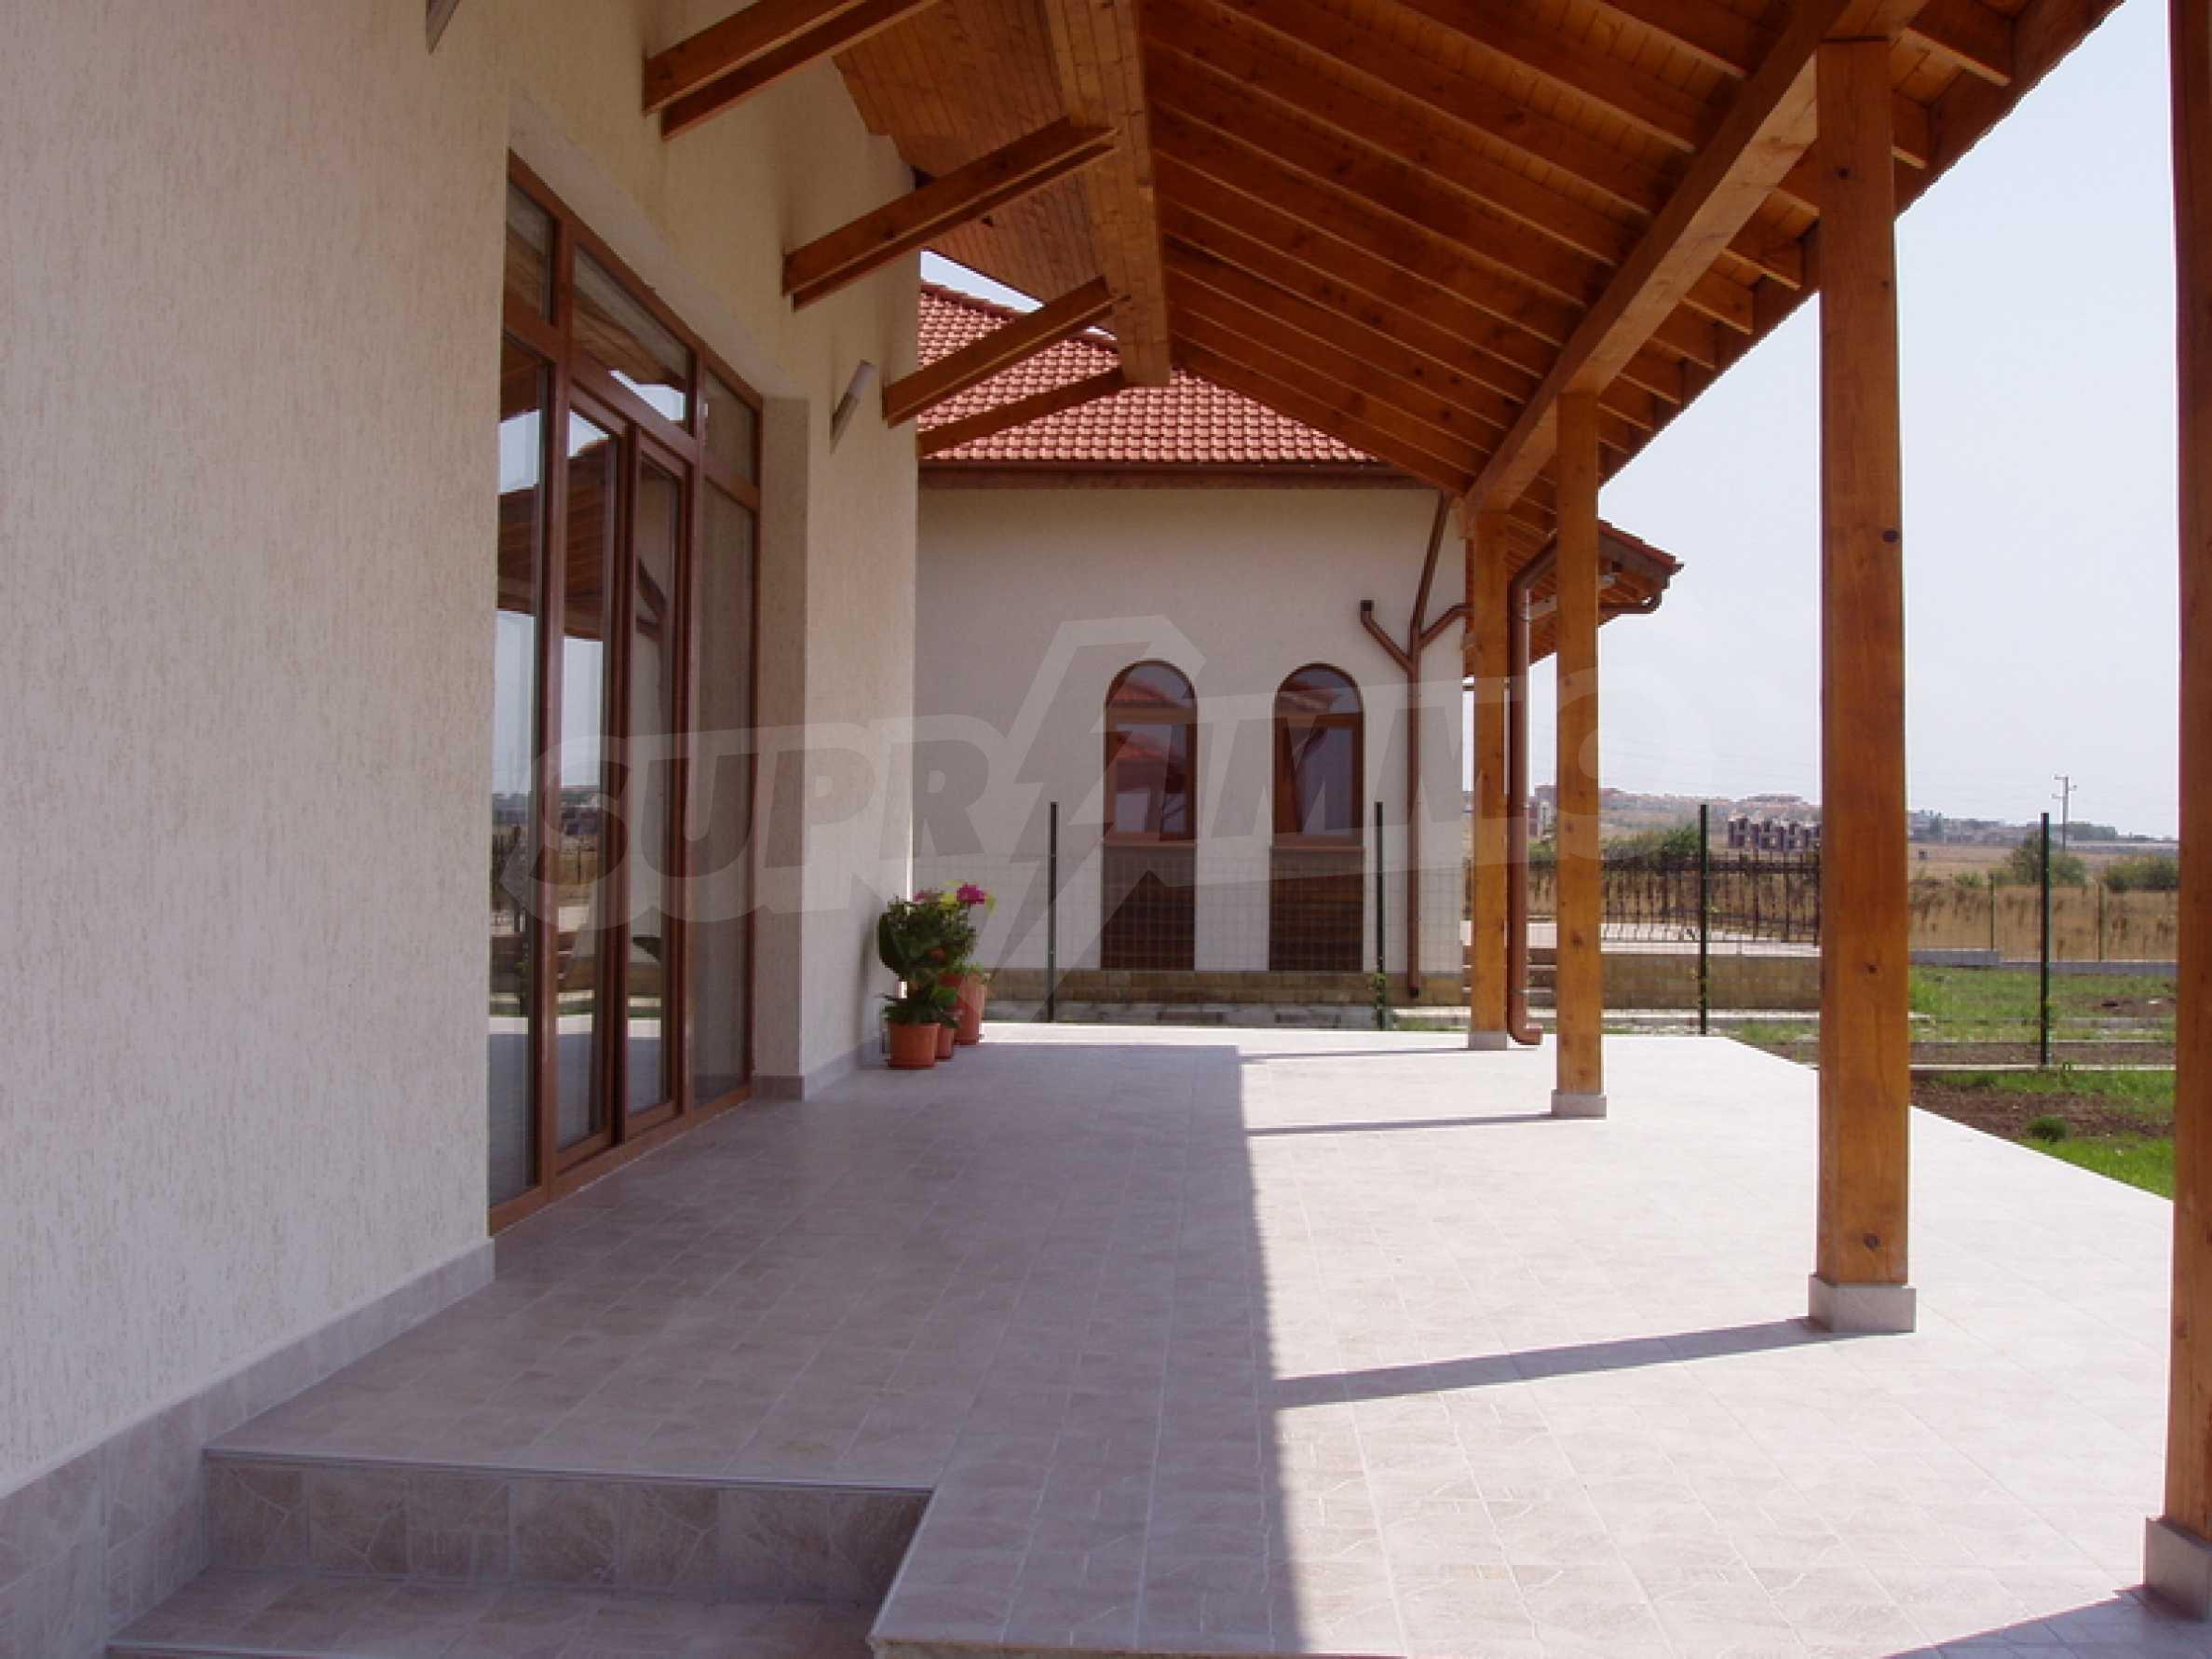 Einstöckige Villa in Kosharitsa 2